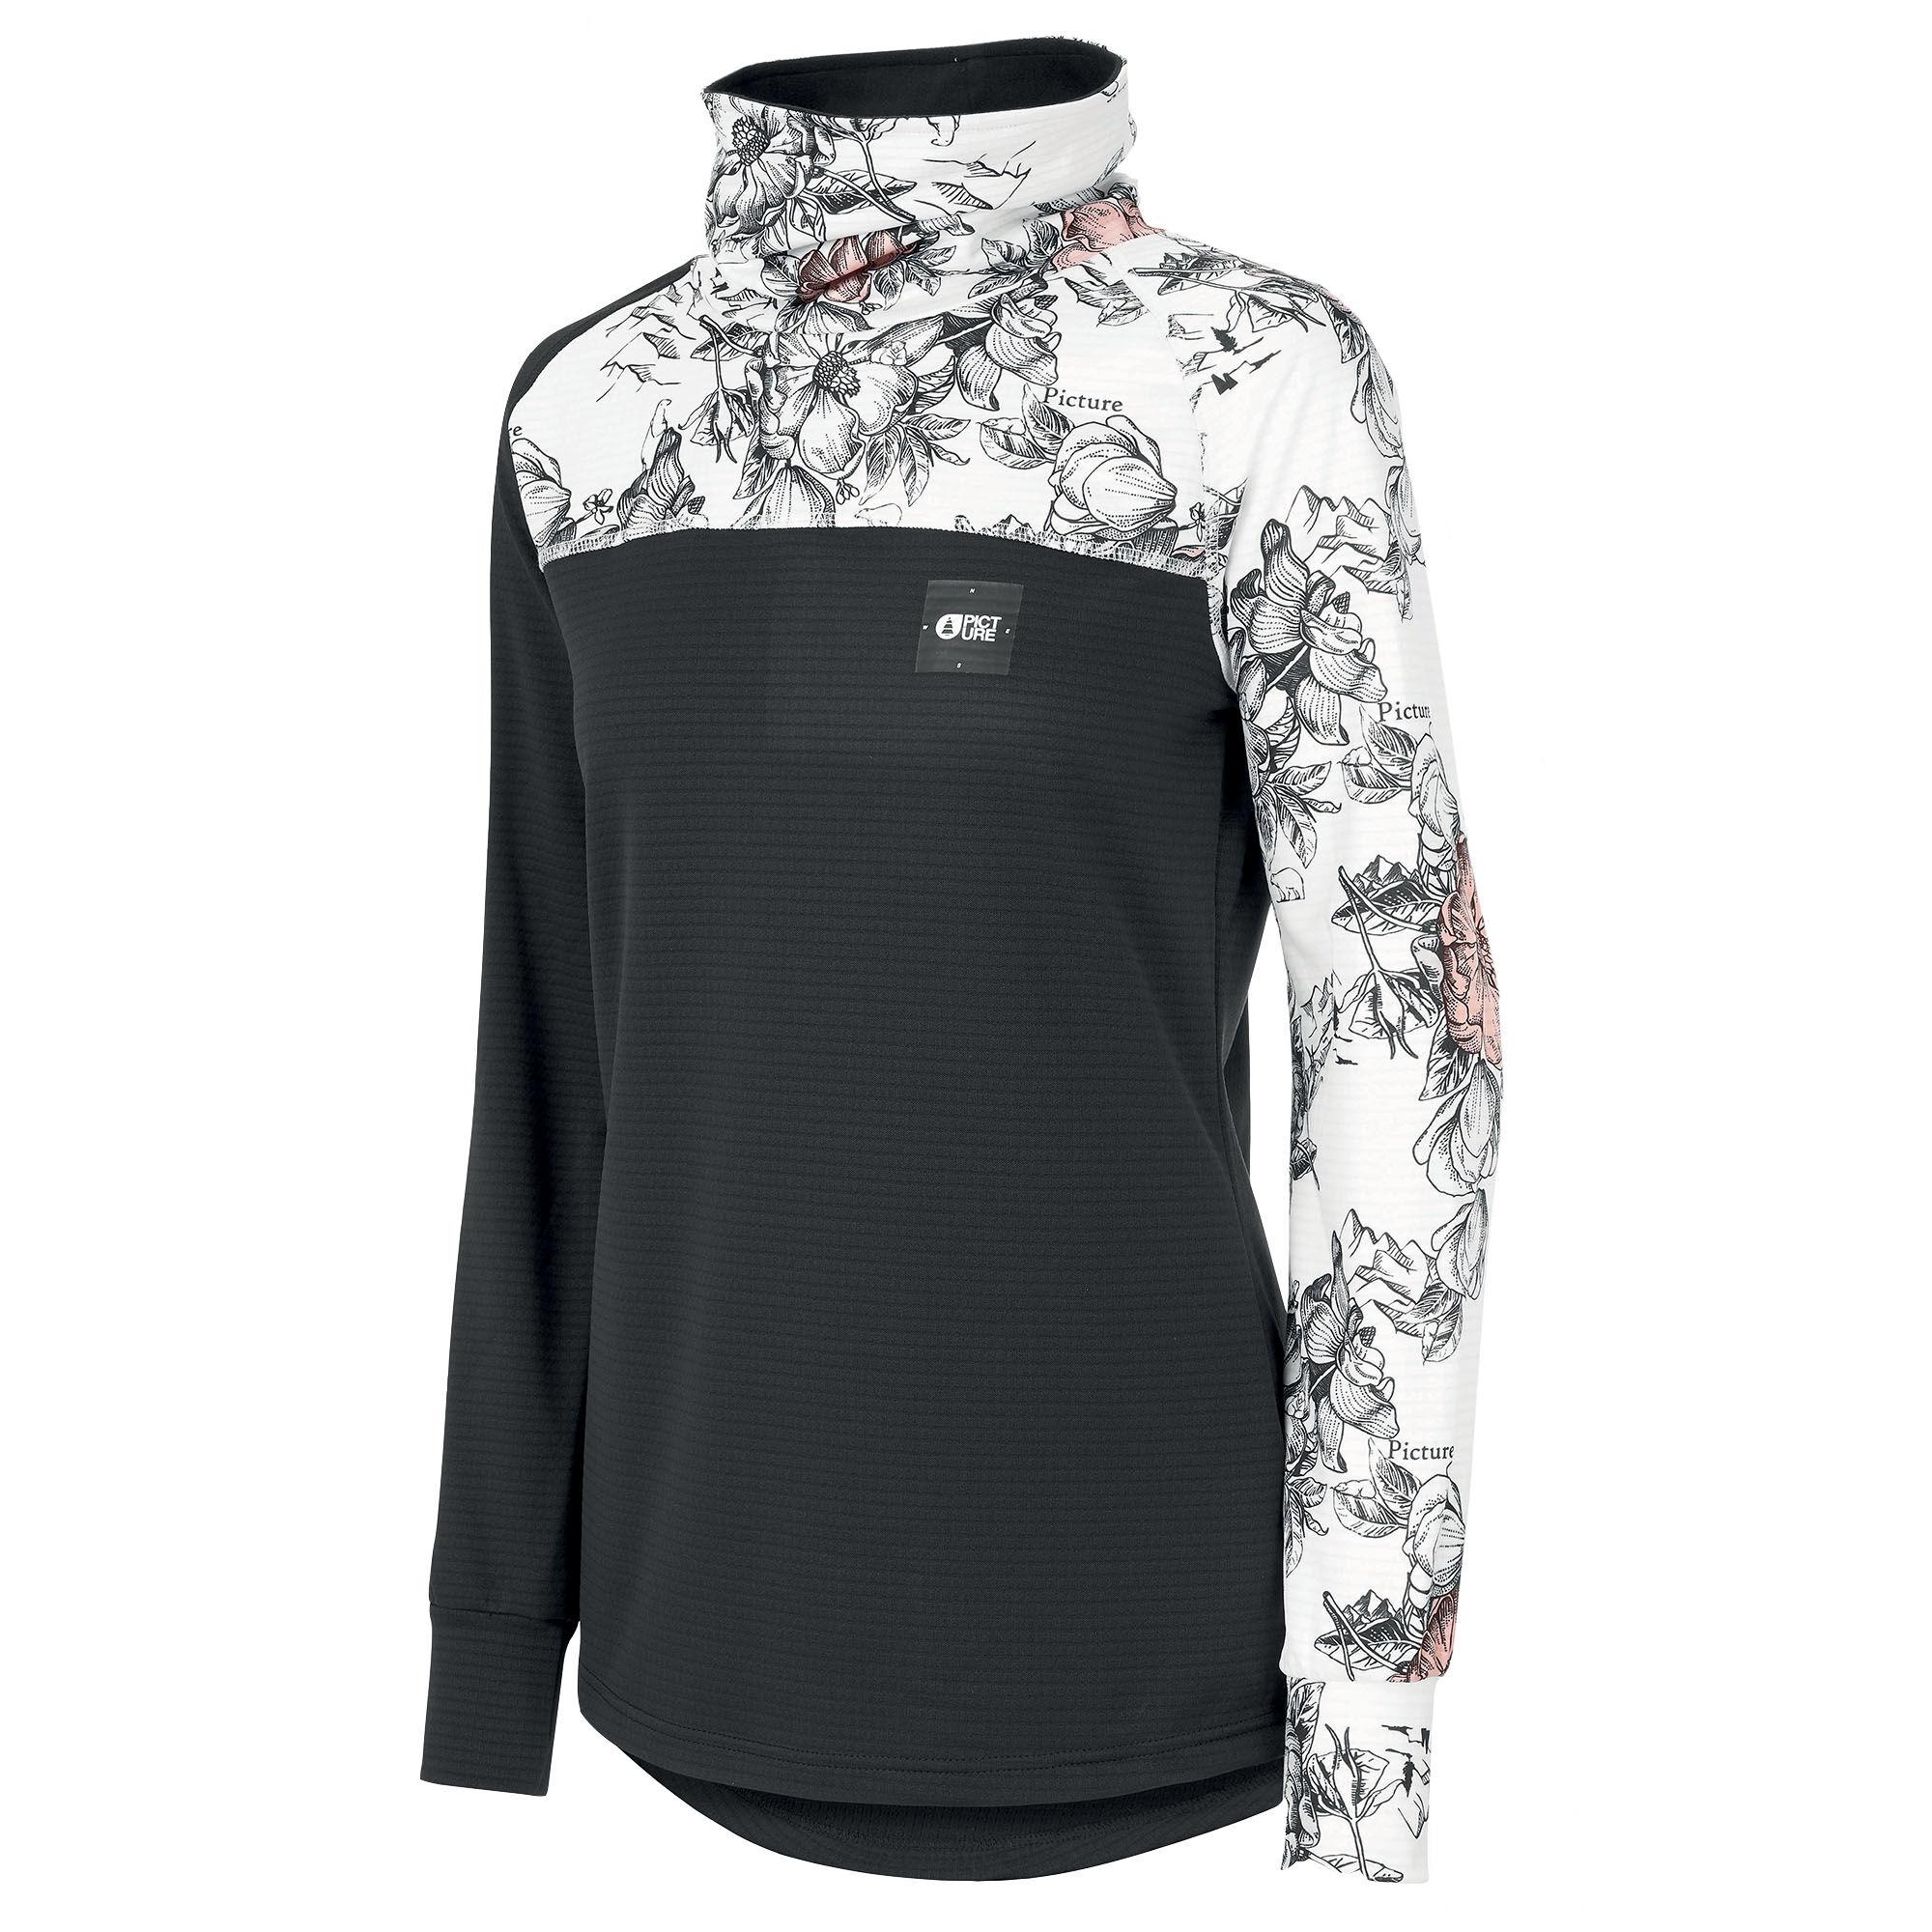 Picture Organic Clothing Women's Blossom Grid Fleece Shirt  - Peonies Black - Size: Medium